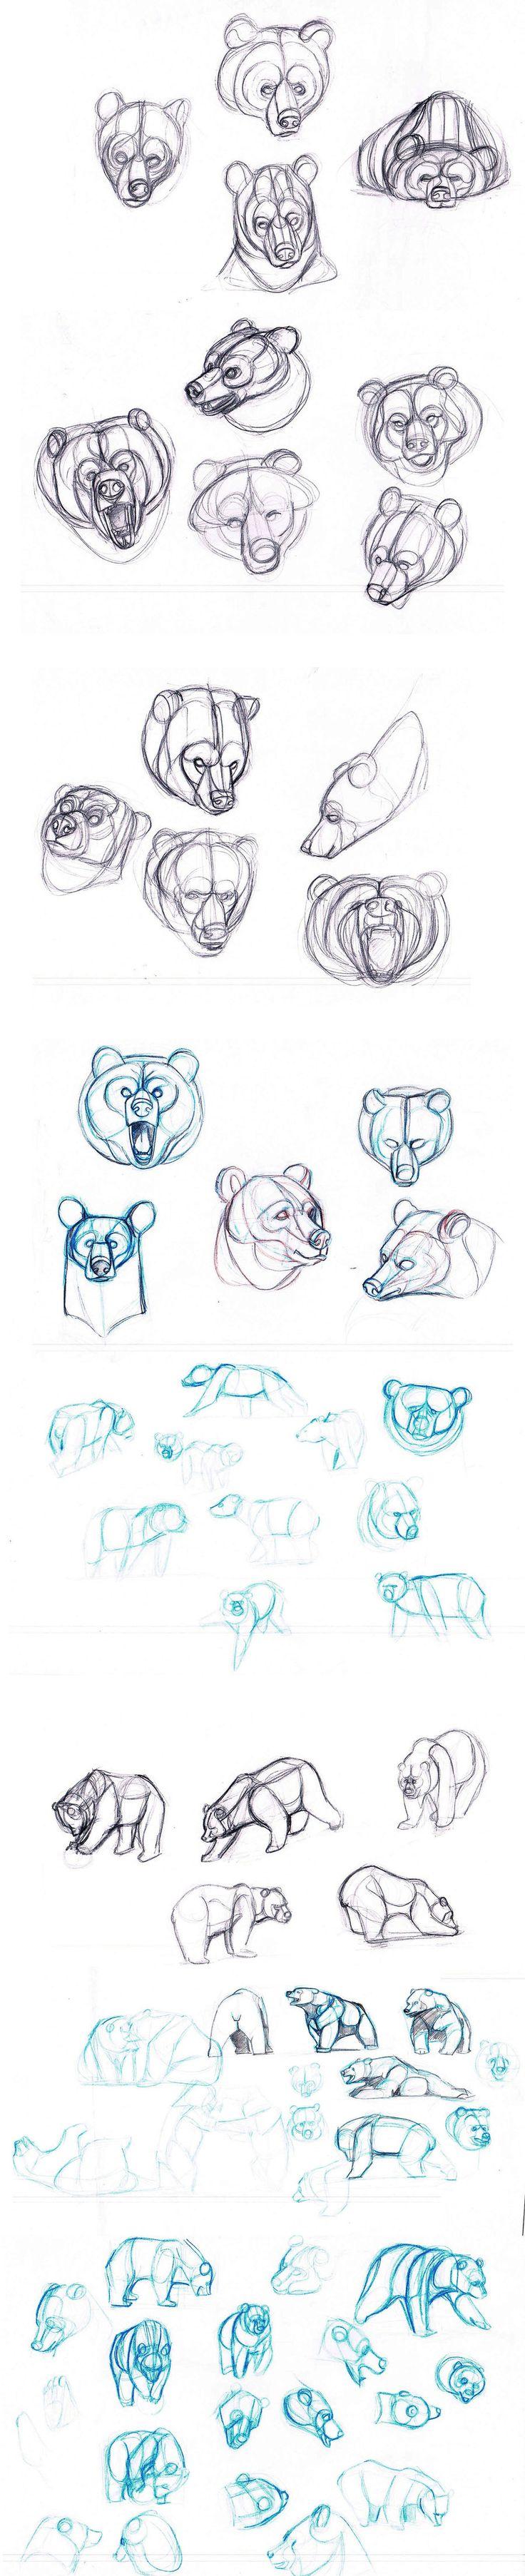 Bears sketches by sofmer.deviantart.com on @deviantART